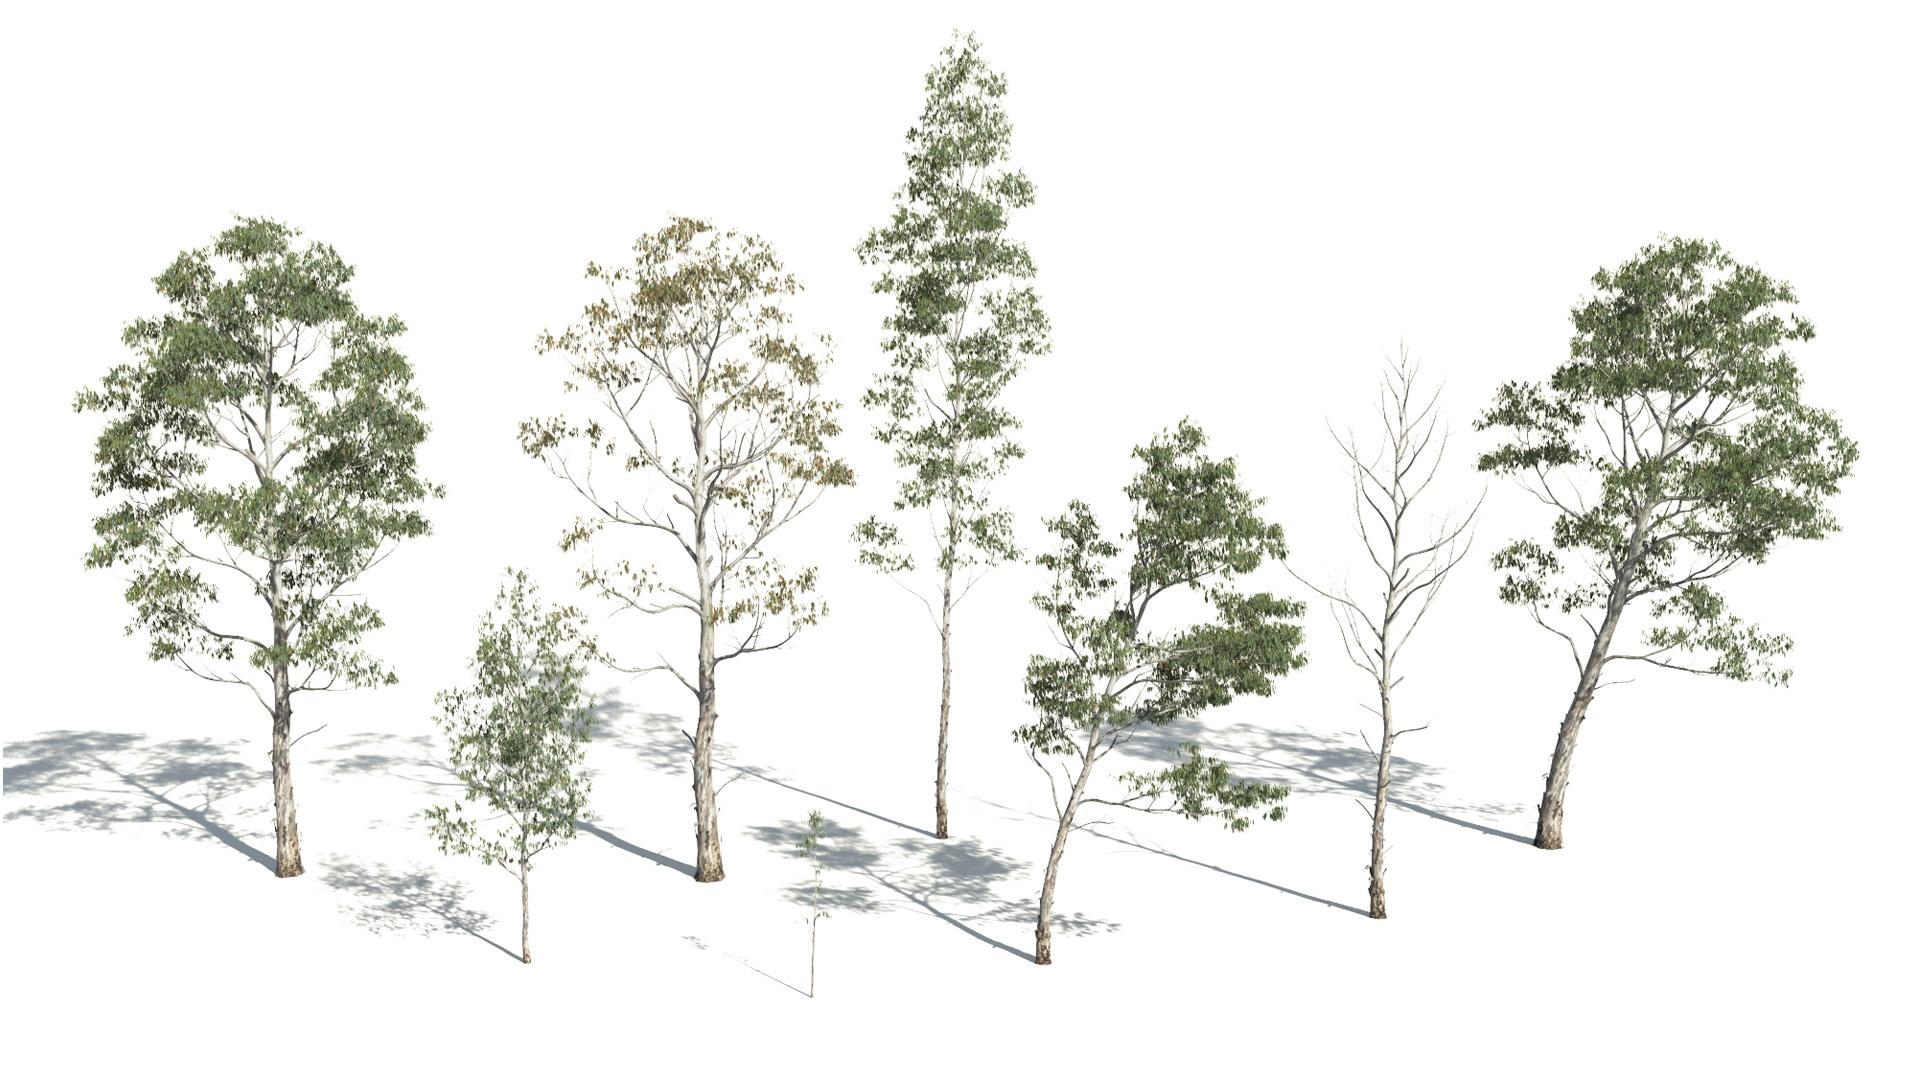 3D model of the Manna gum Eucalyptus viminalis different presets